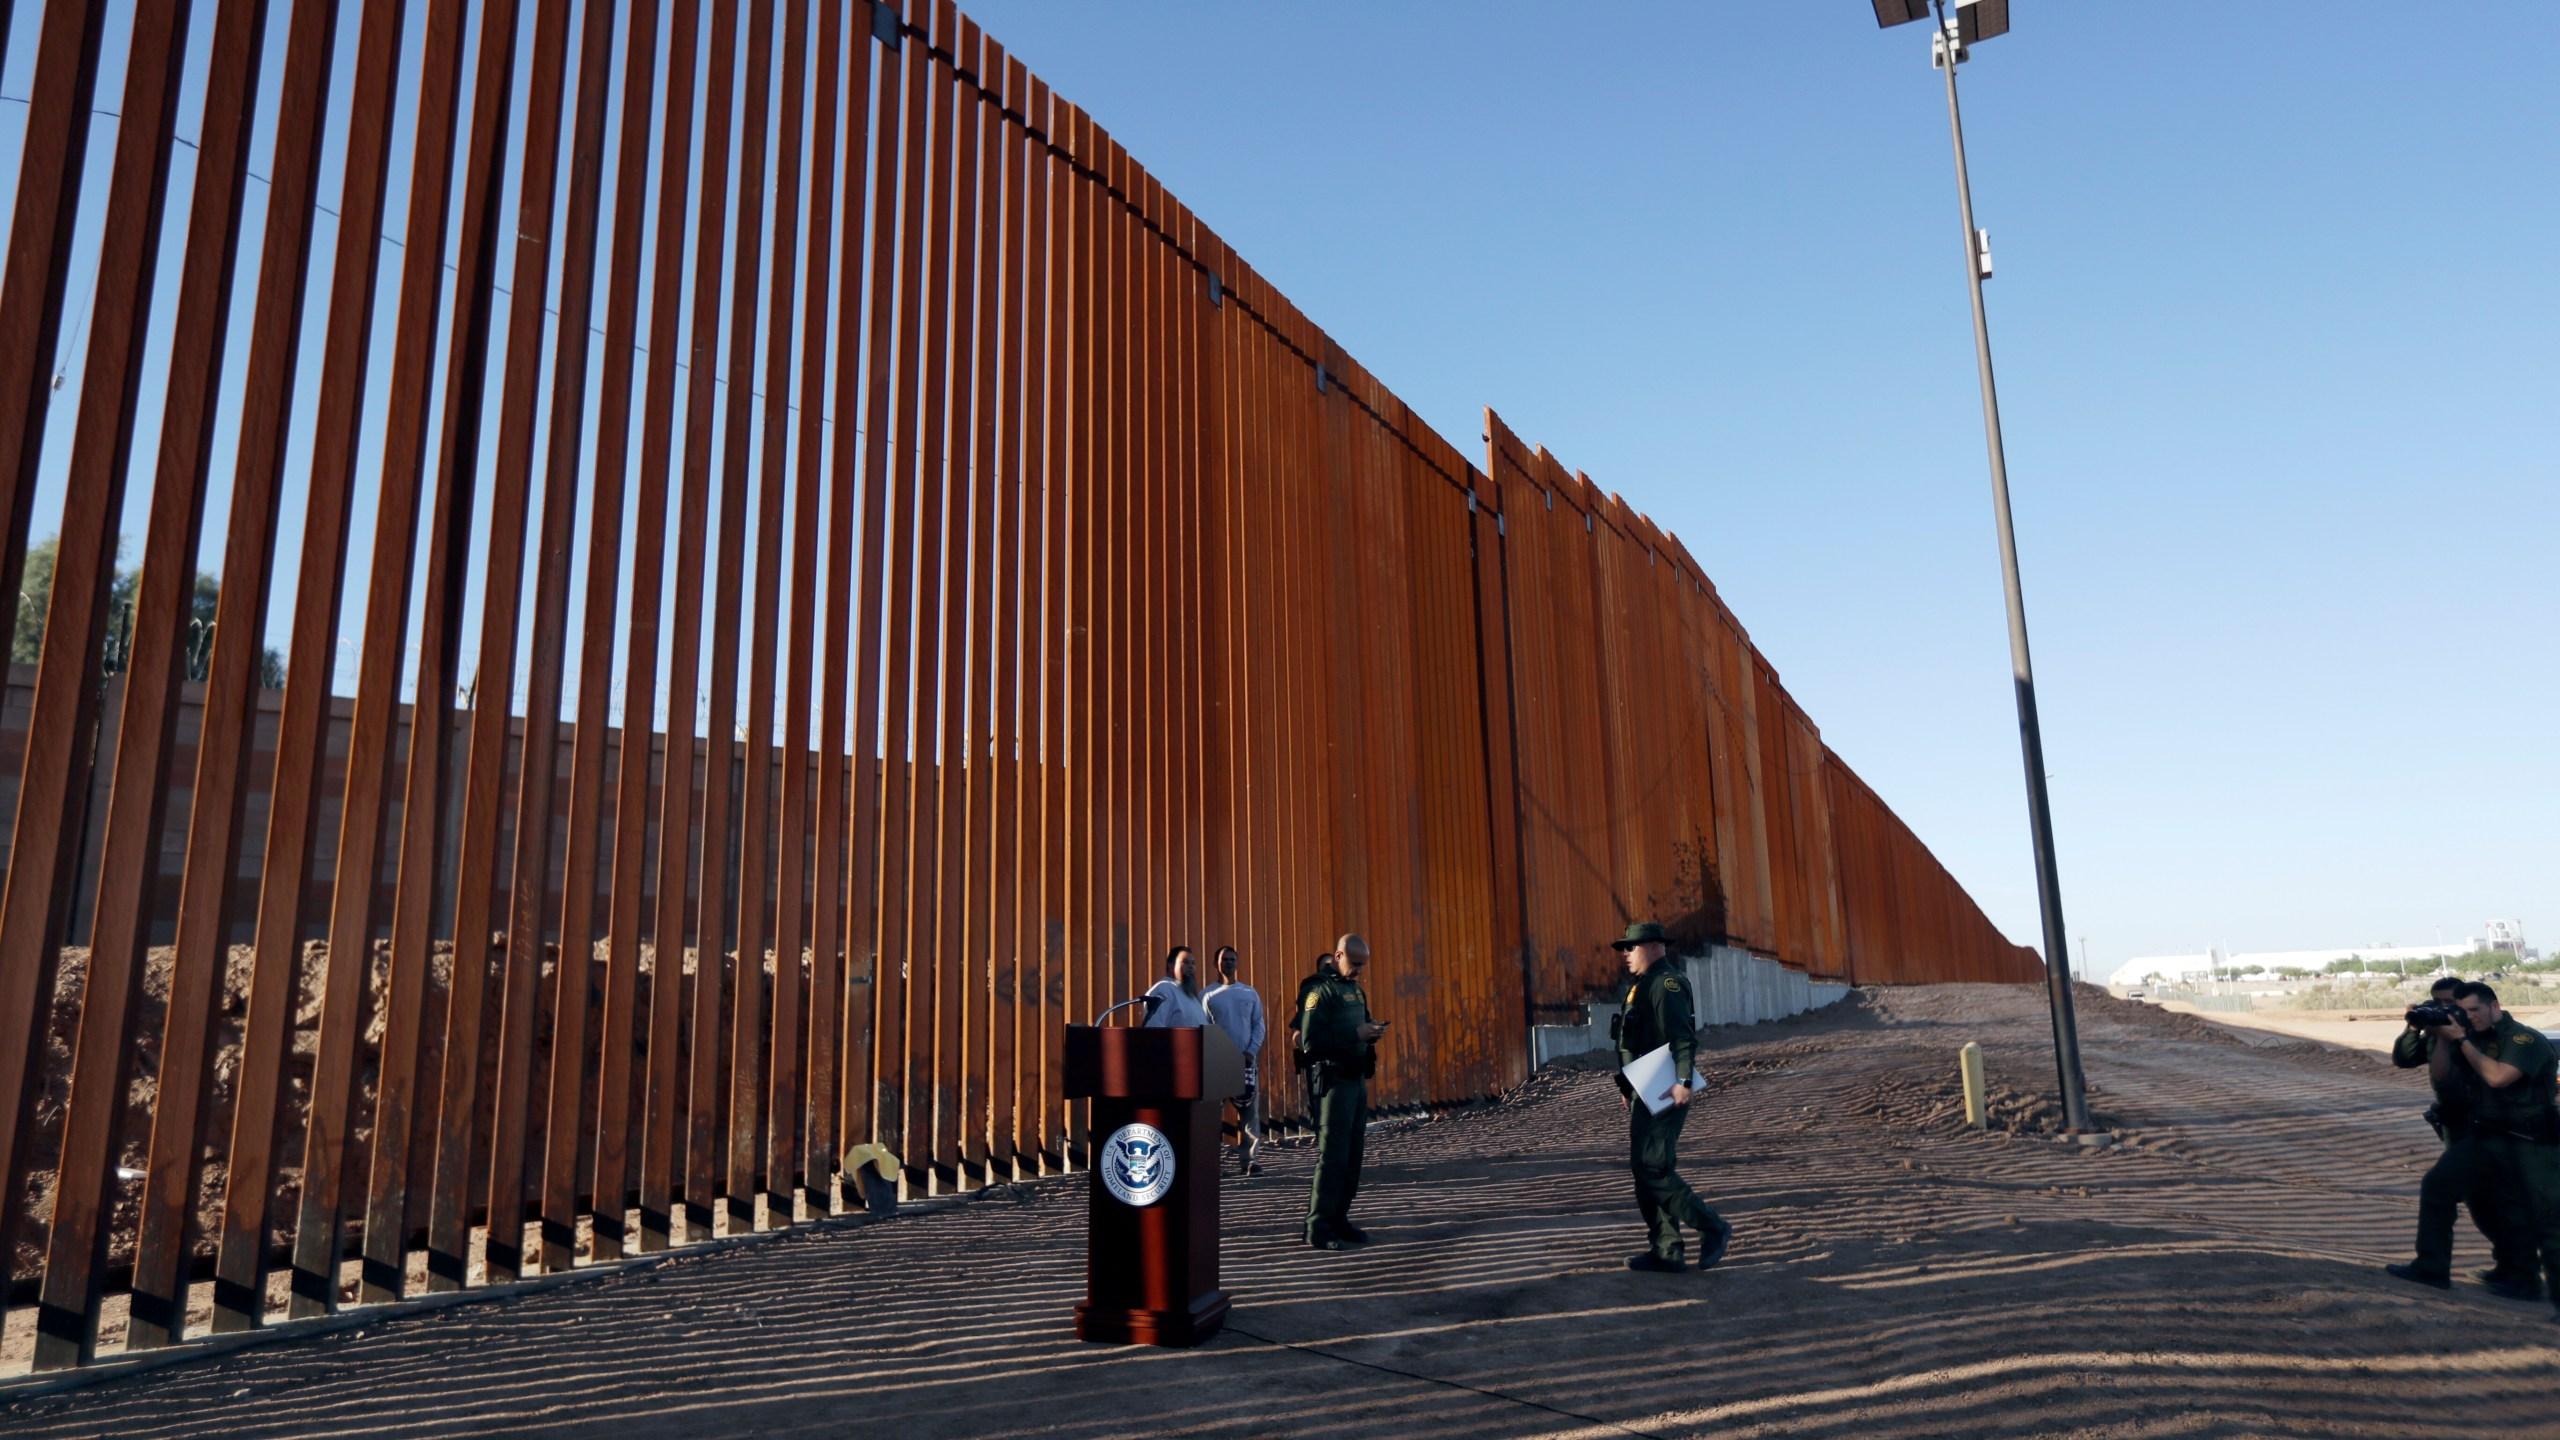 Immigration_Border_85556-159532.jpg50631820